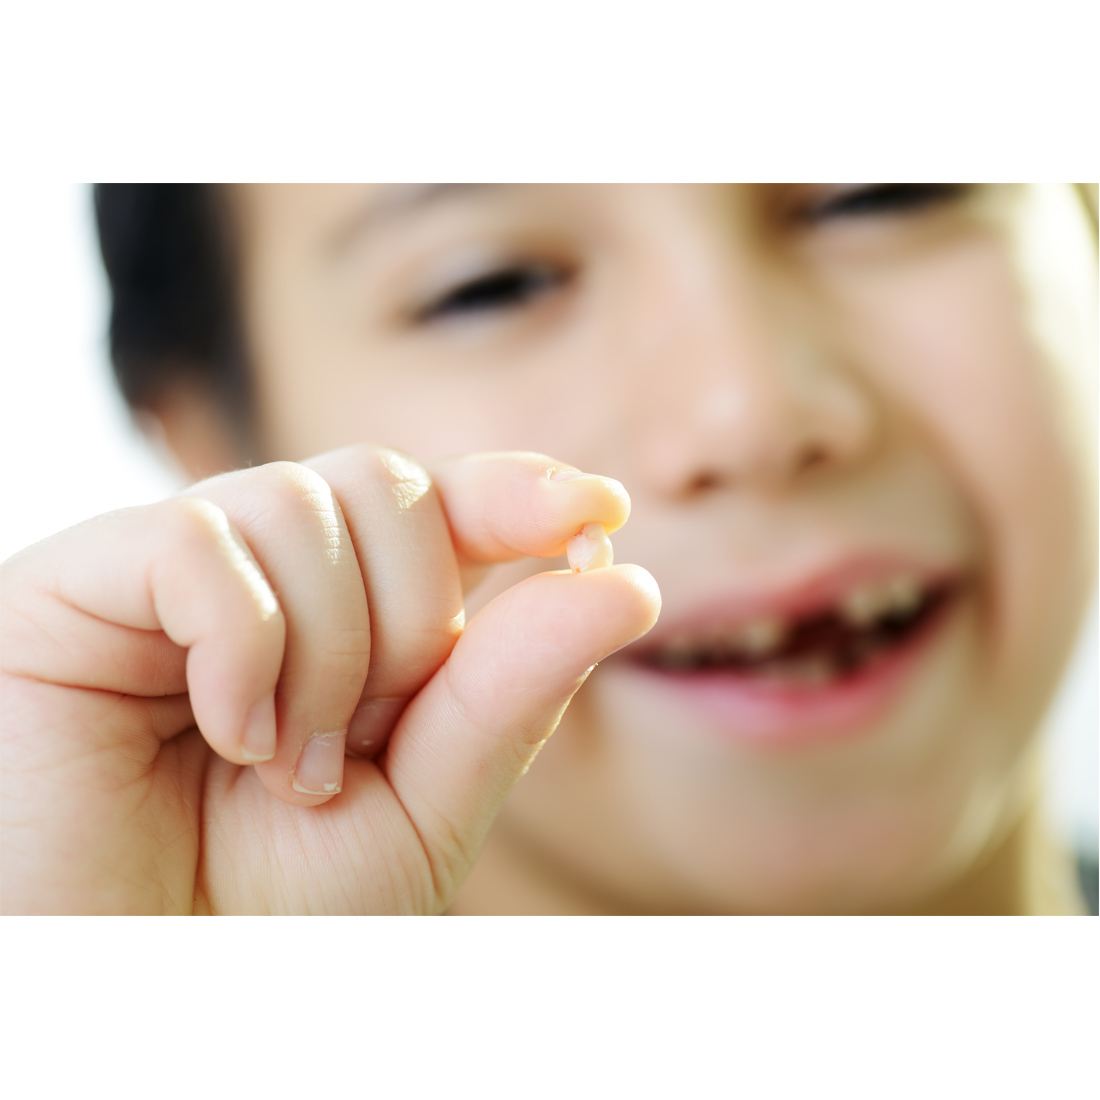 traumatismo-diente-dental-odontologia-dentista-dentality-talavera